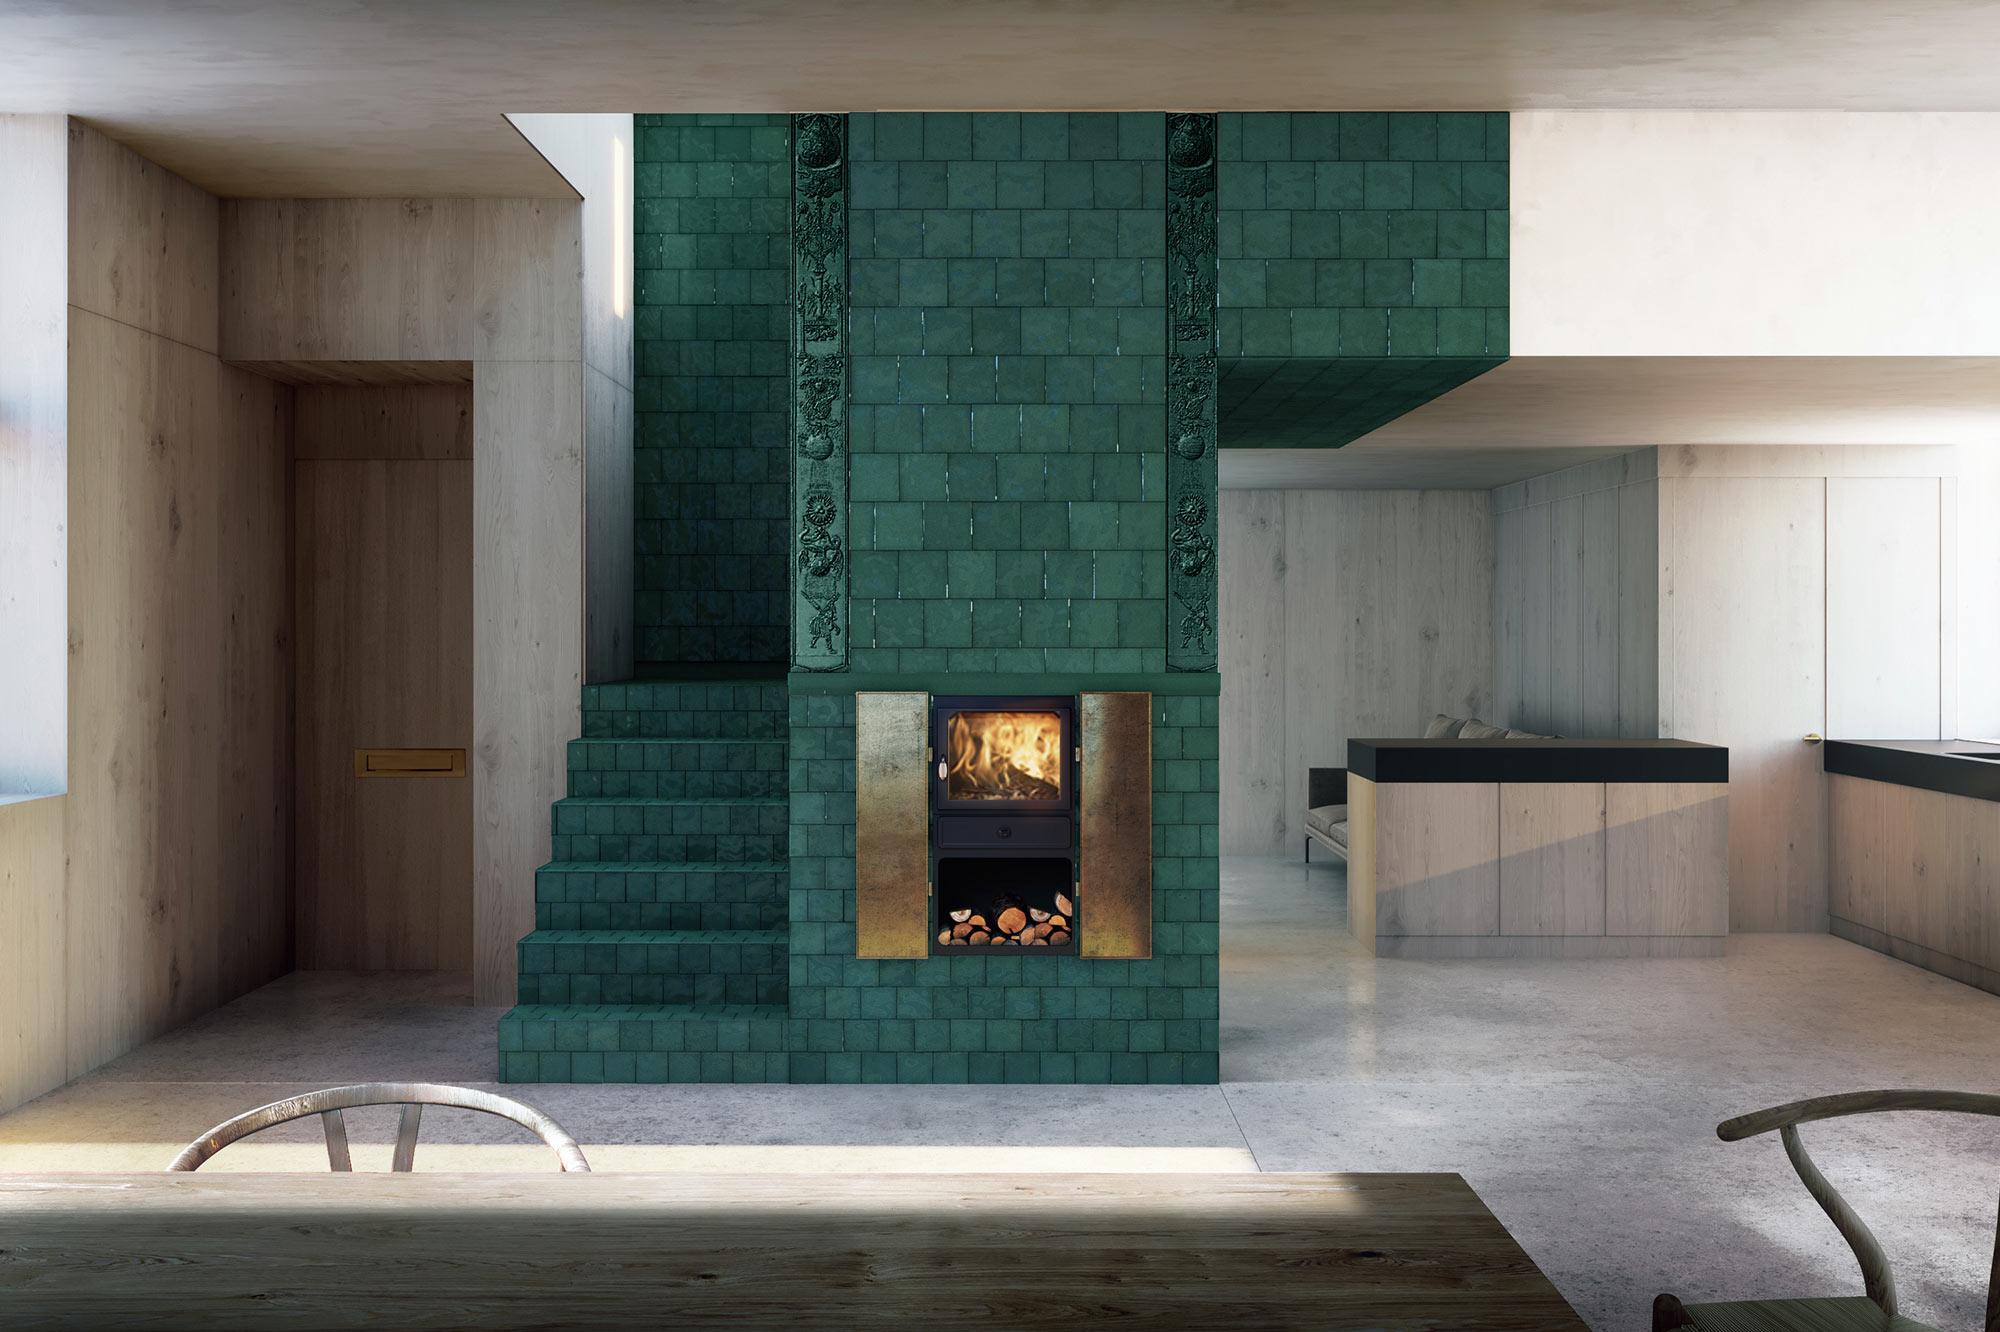 cube-haus-skene-catling-architects-cs-2000×1332-02